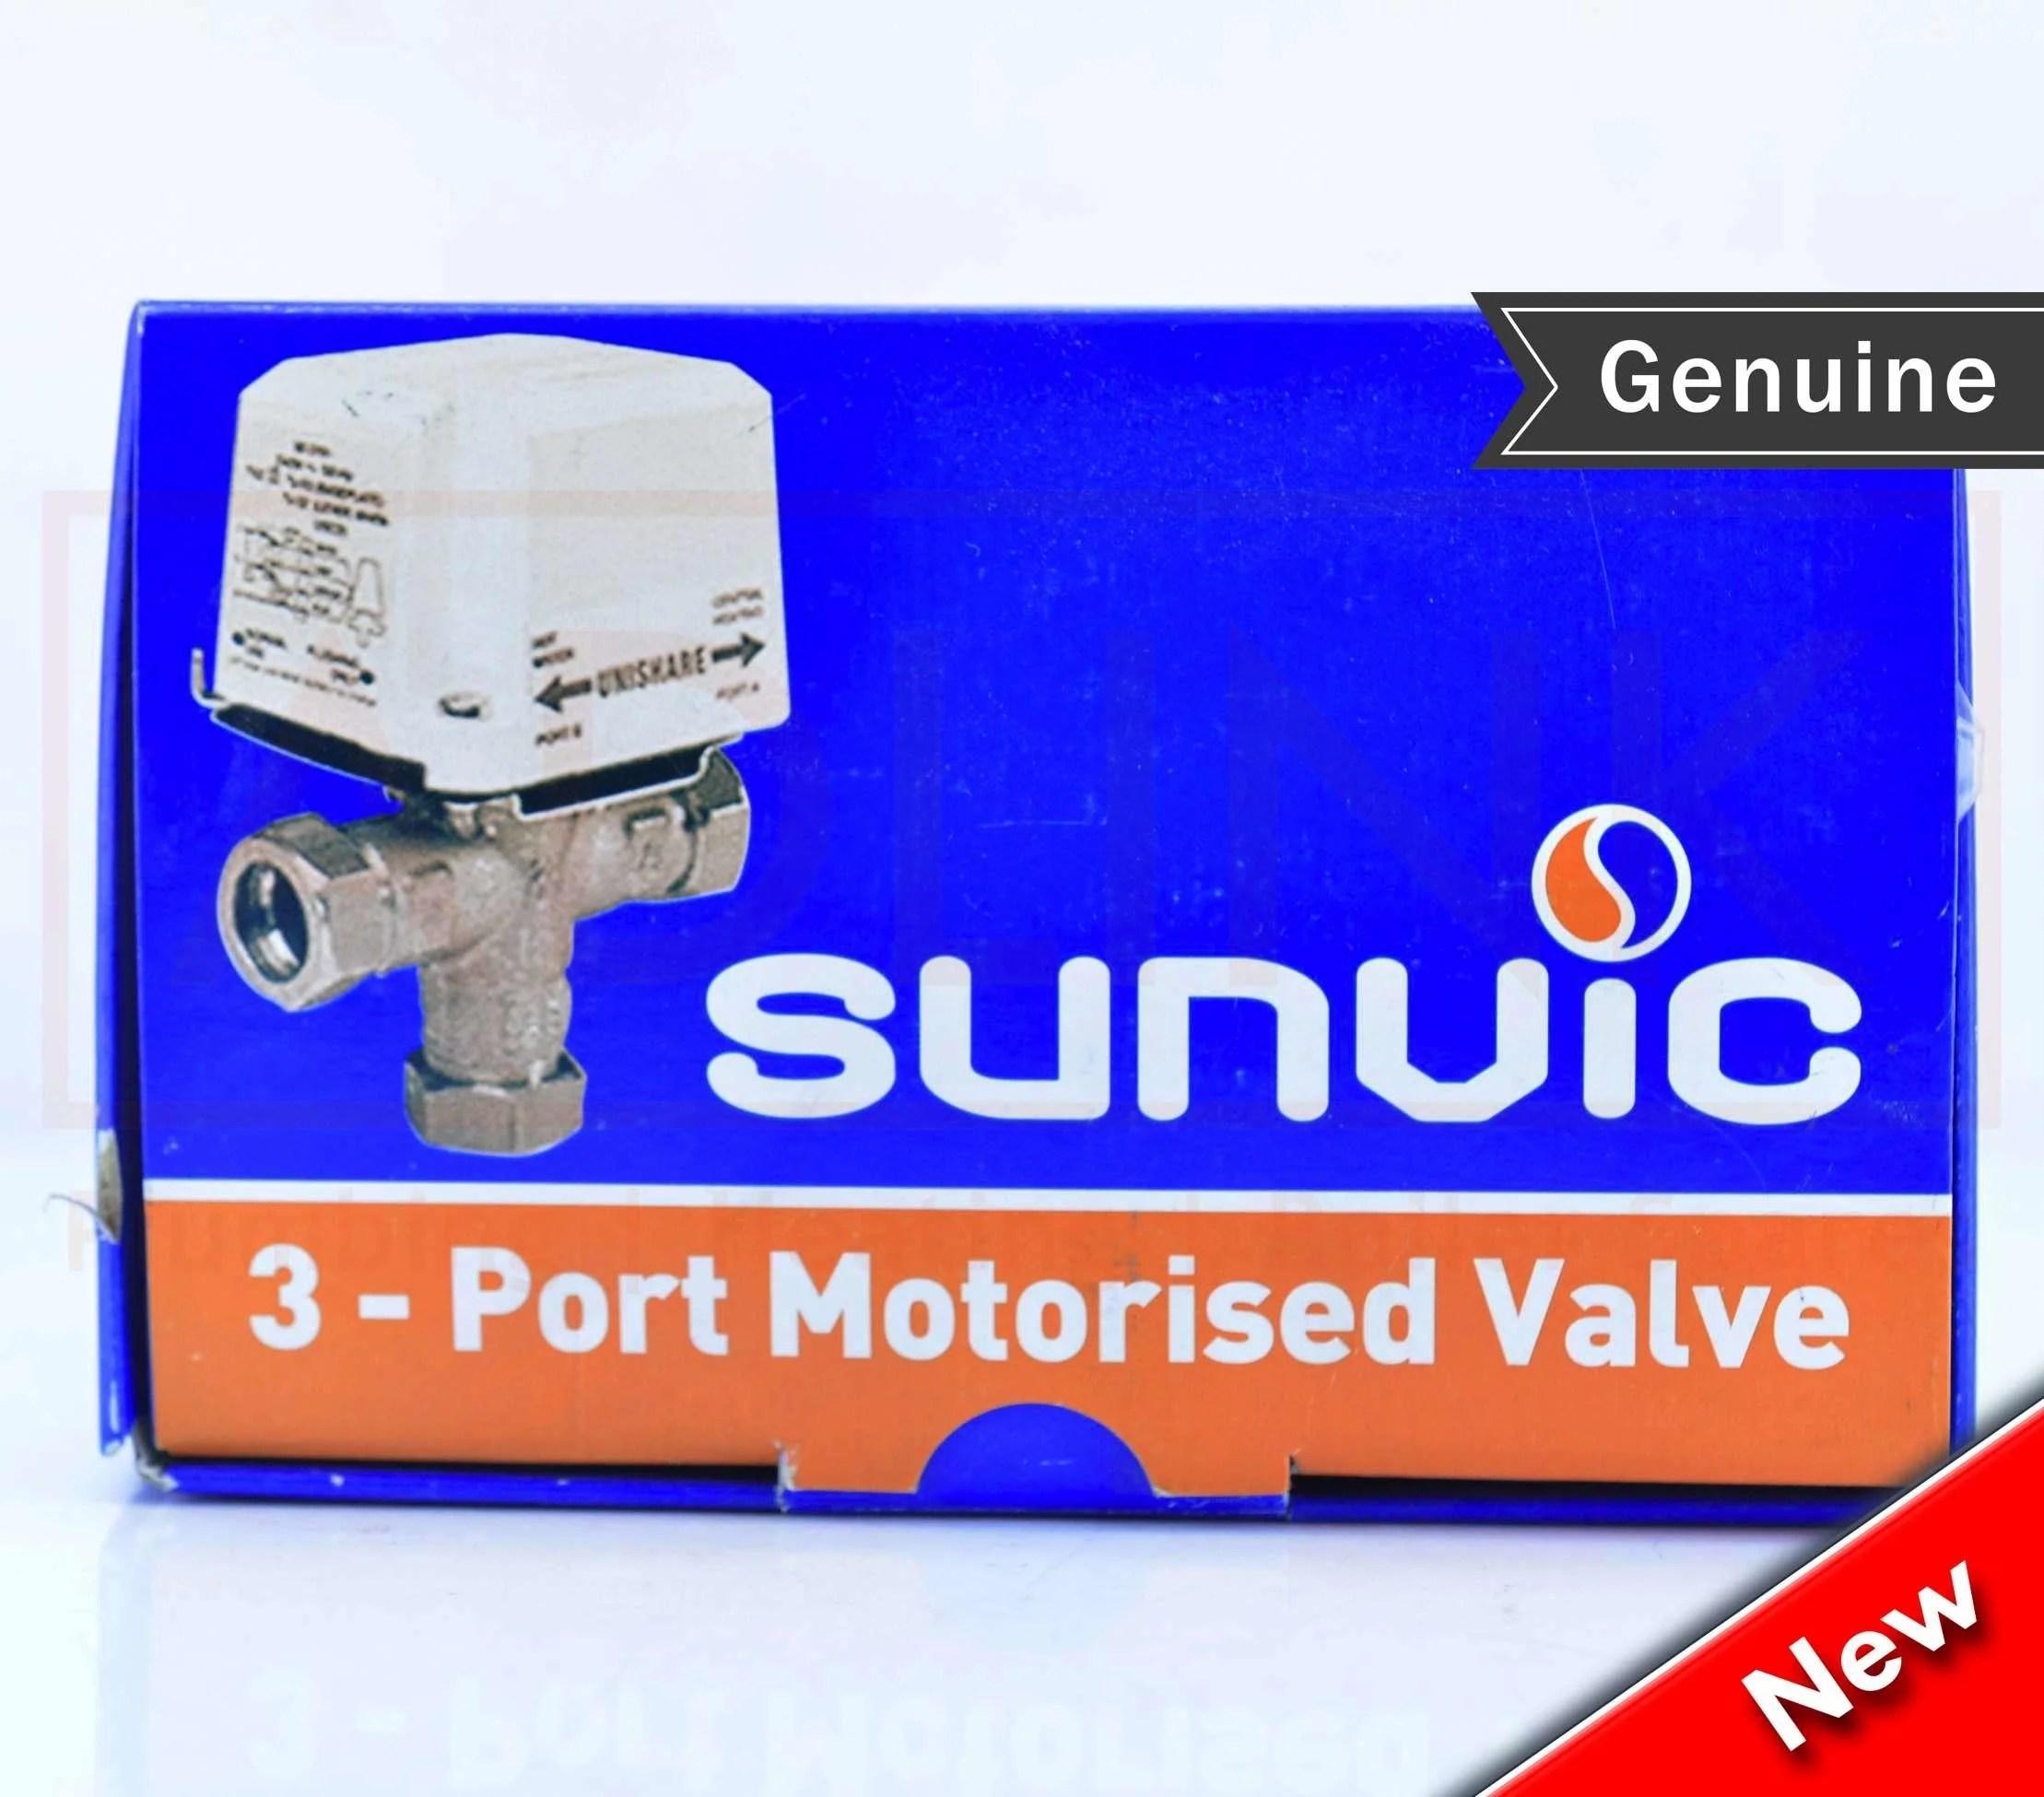 3 port motorised valve wiring diagram mk4 jetta tdi sunvic 22mm 4 wire sdmv2304